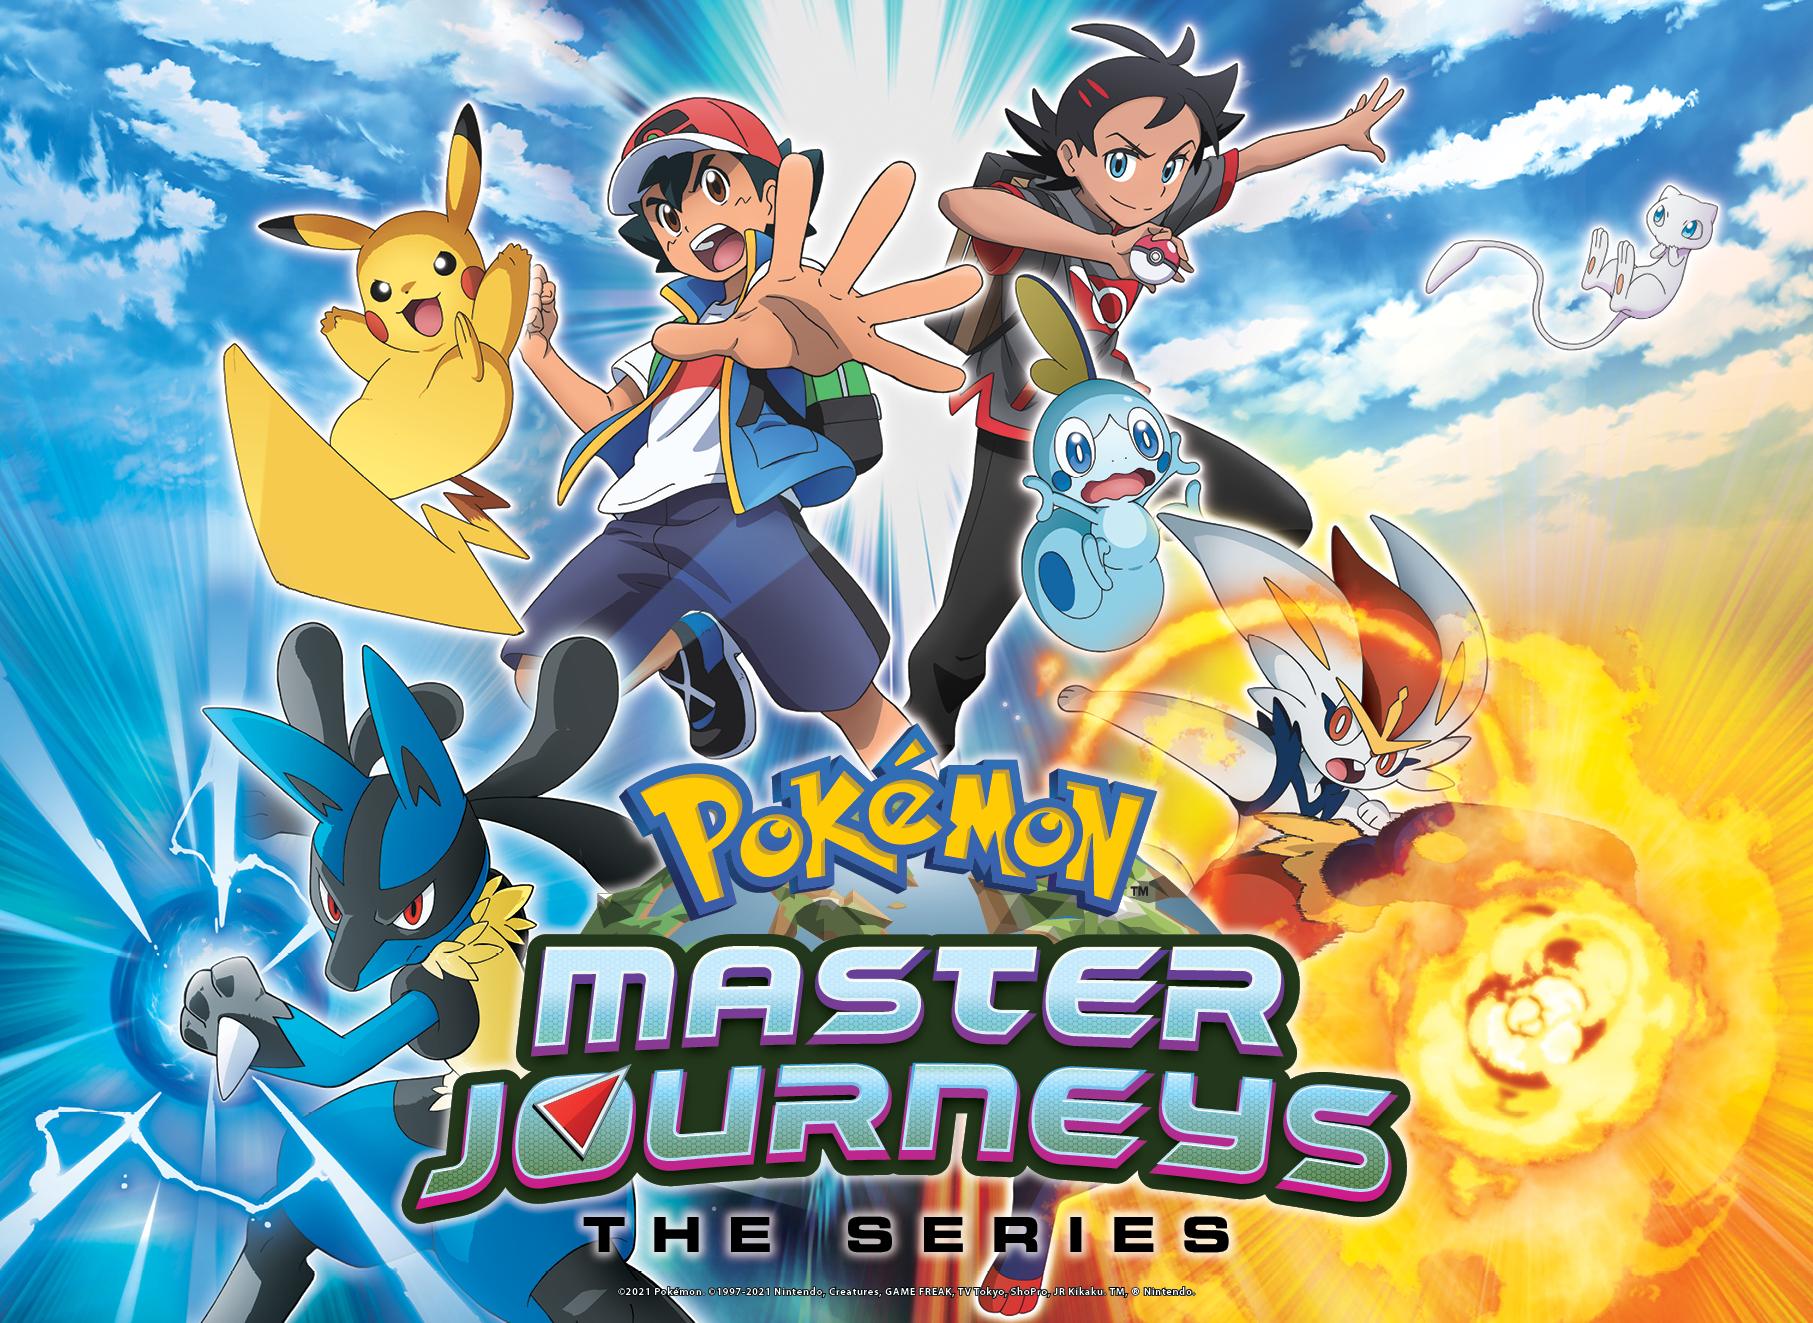 Master Journeys